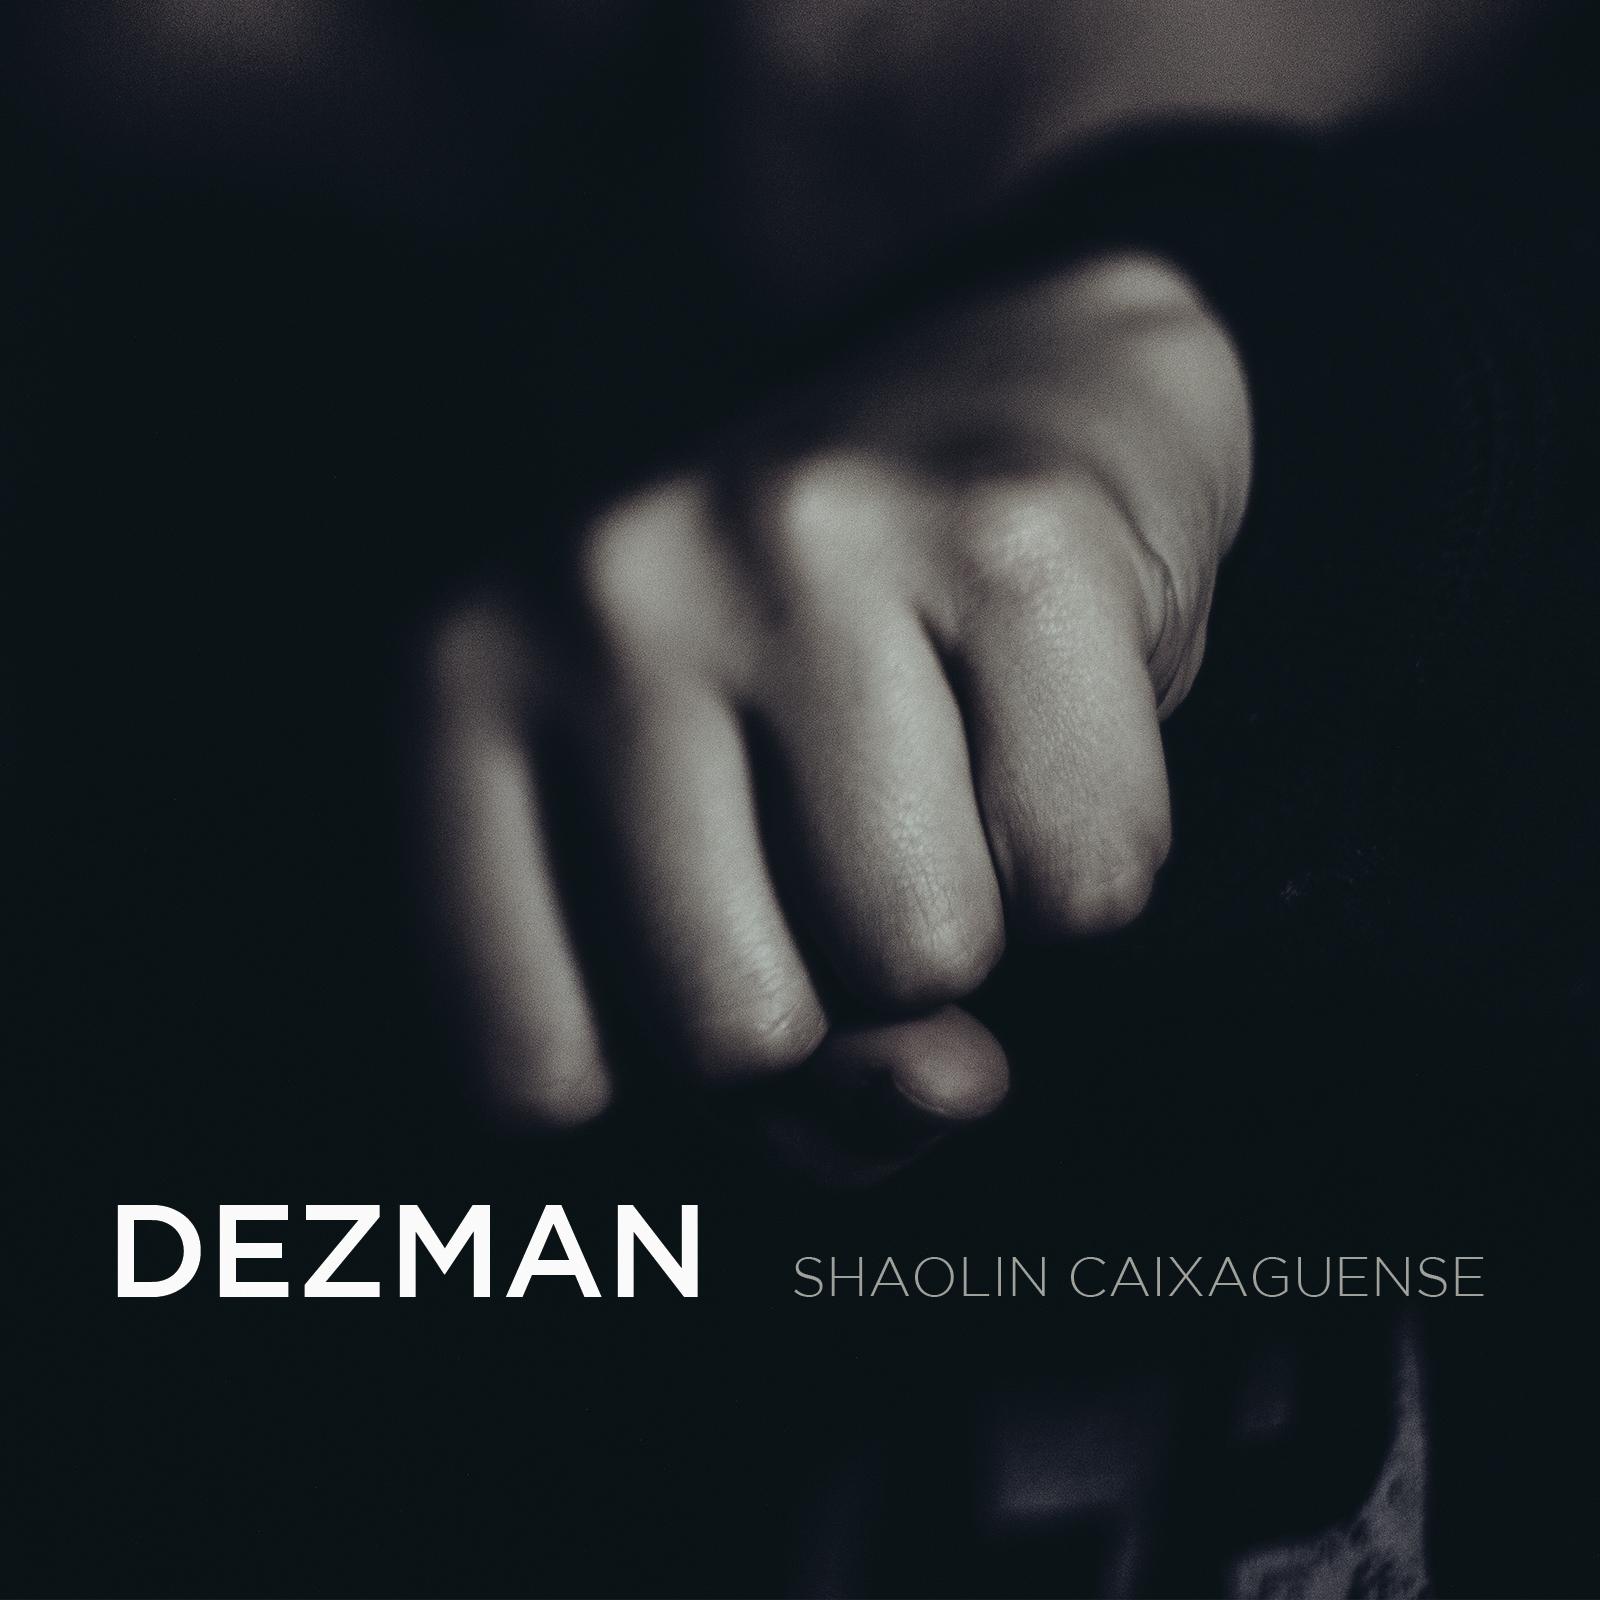 Dezman - Shaolin Caixaguense